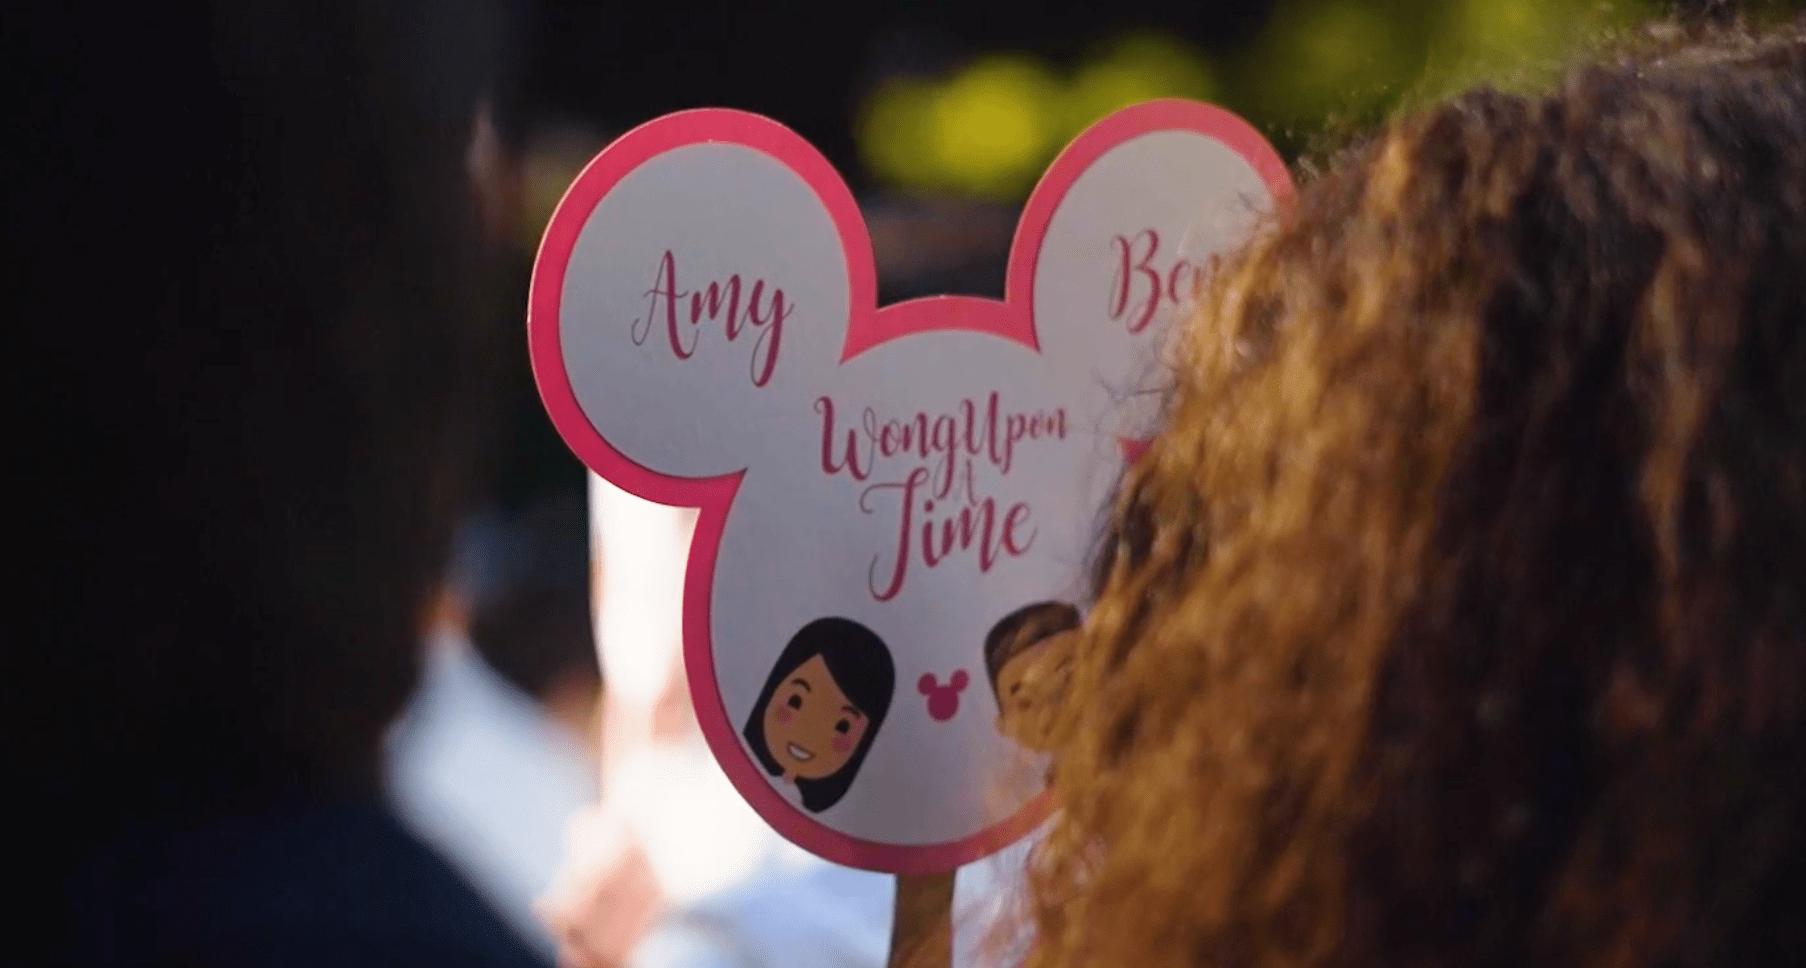 disney-wedding-theme-ceremony-fans